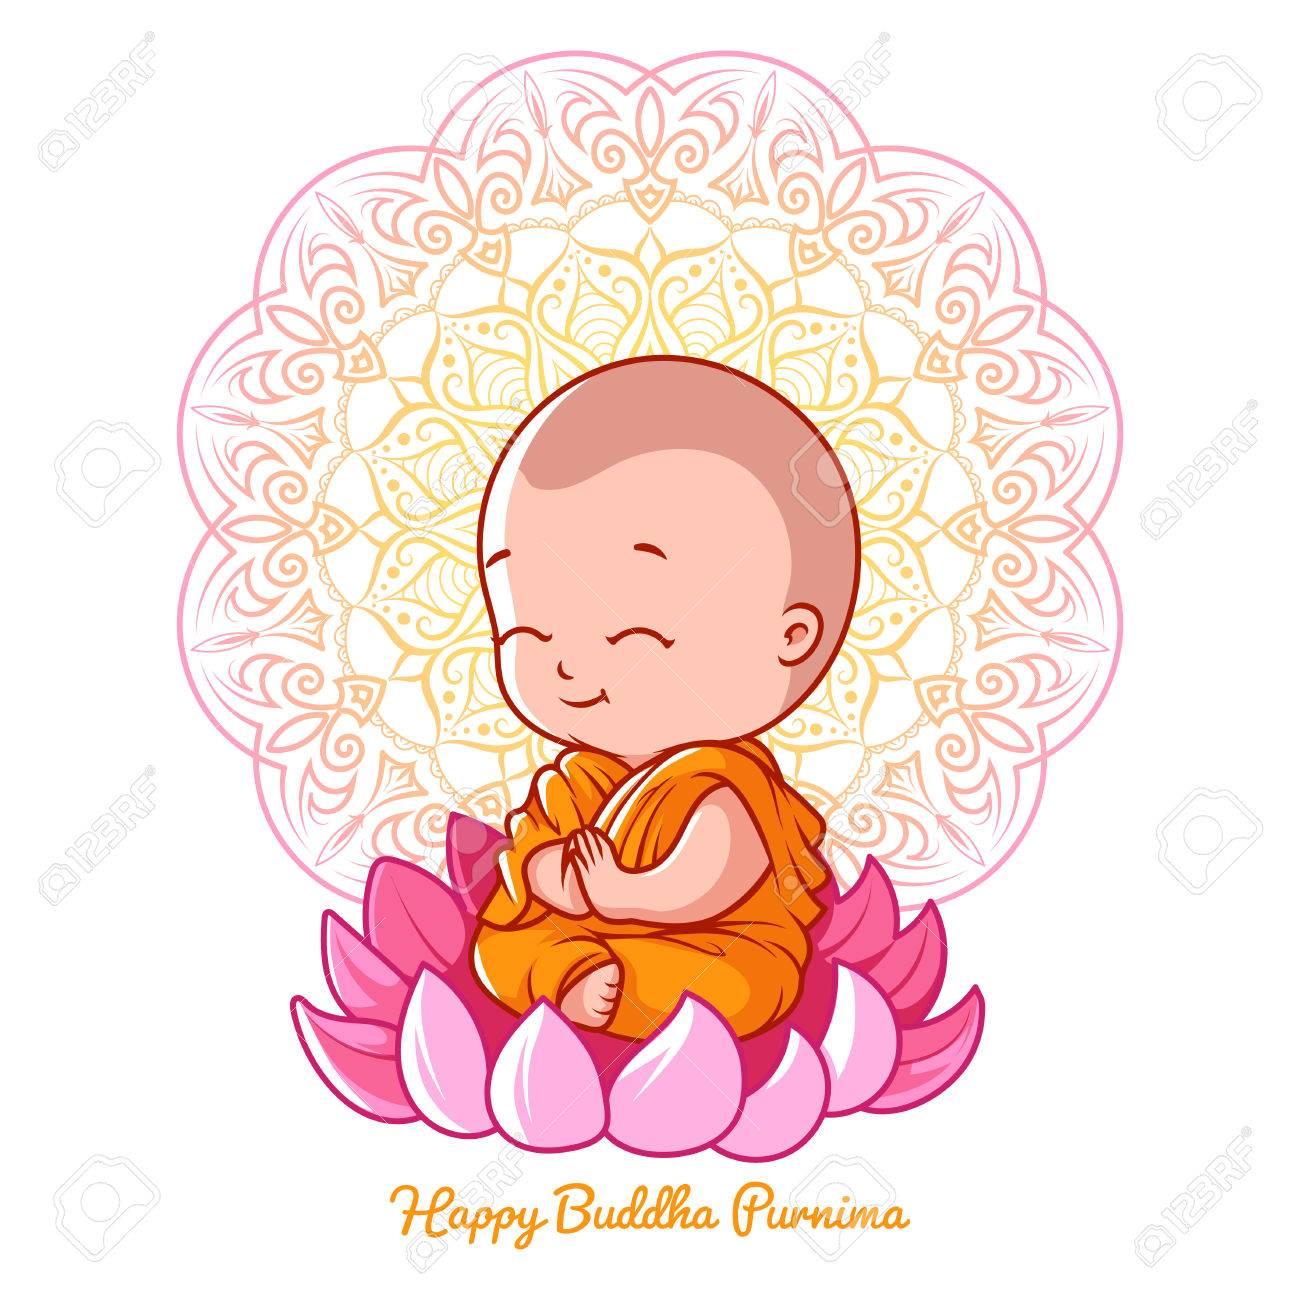 Little Cartoon Monk On The Lotus Greeting Card For Buddha Birthday